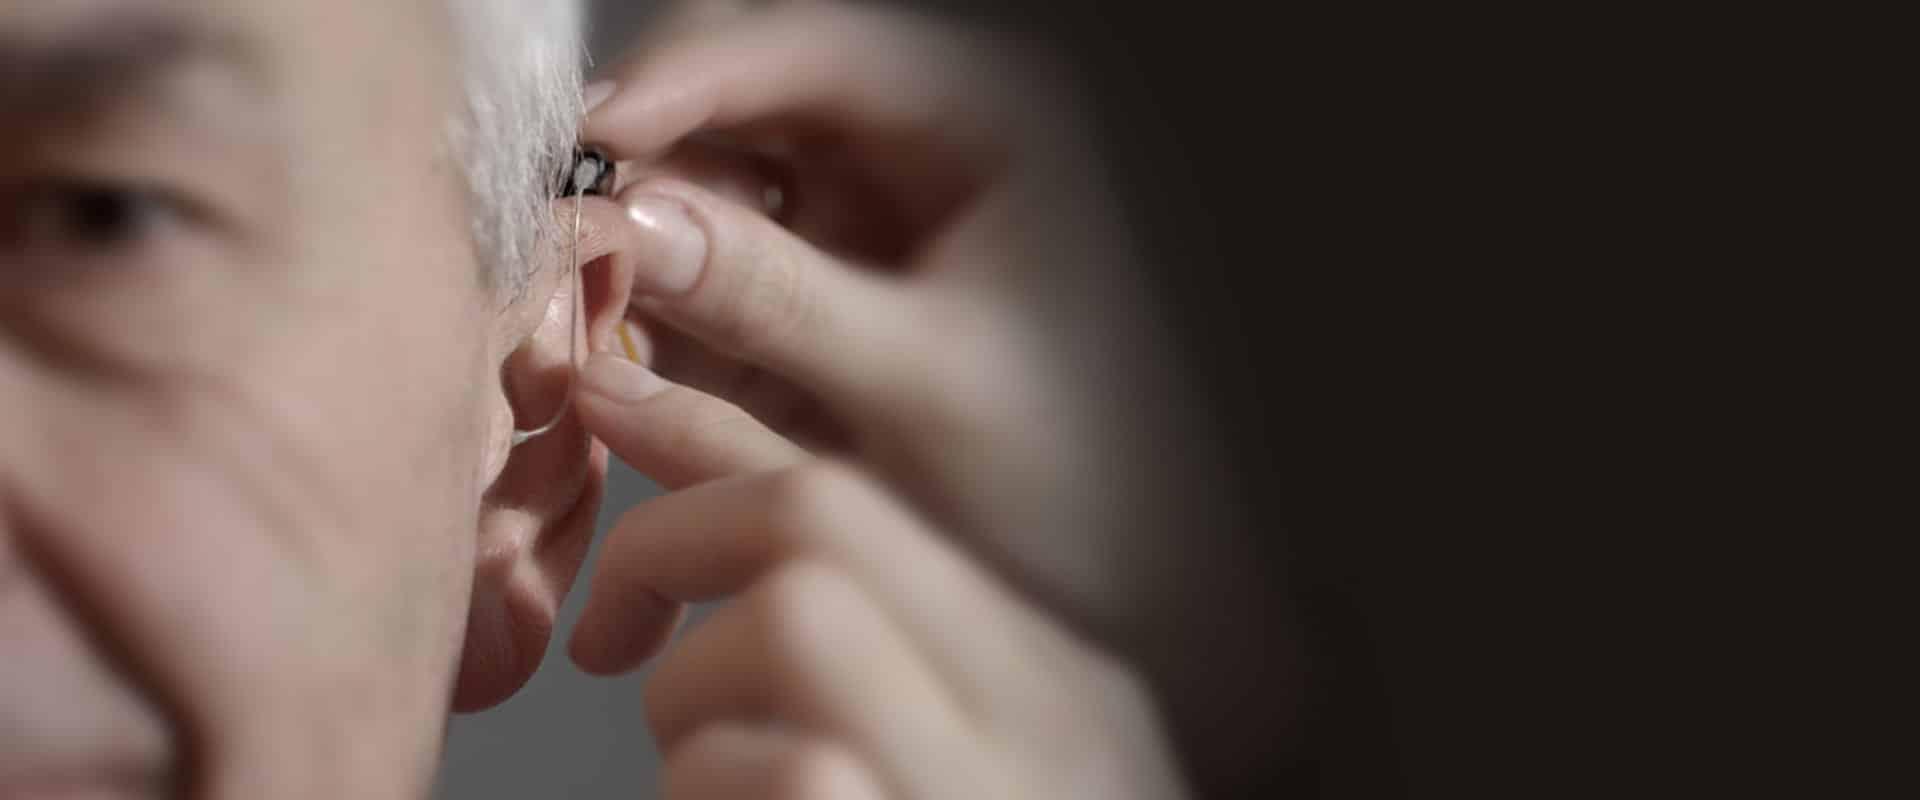 Installer un appareil auditif